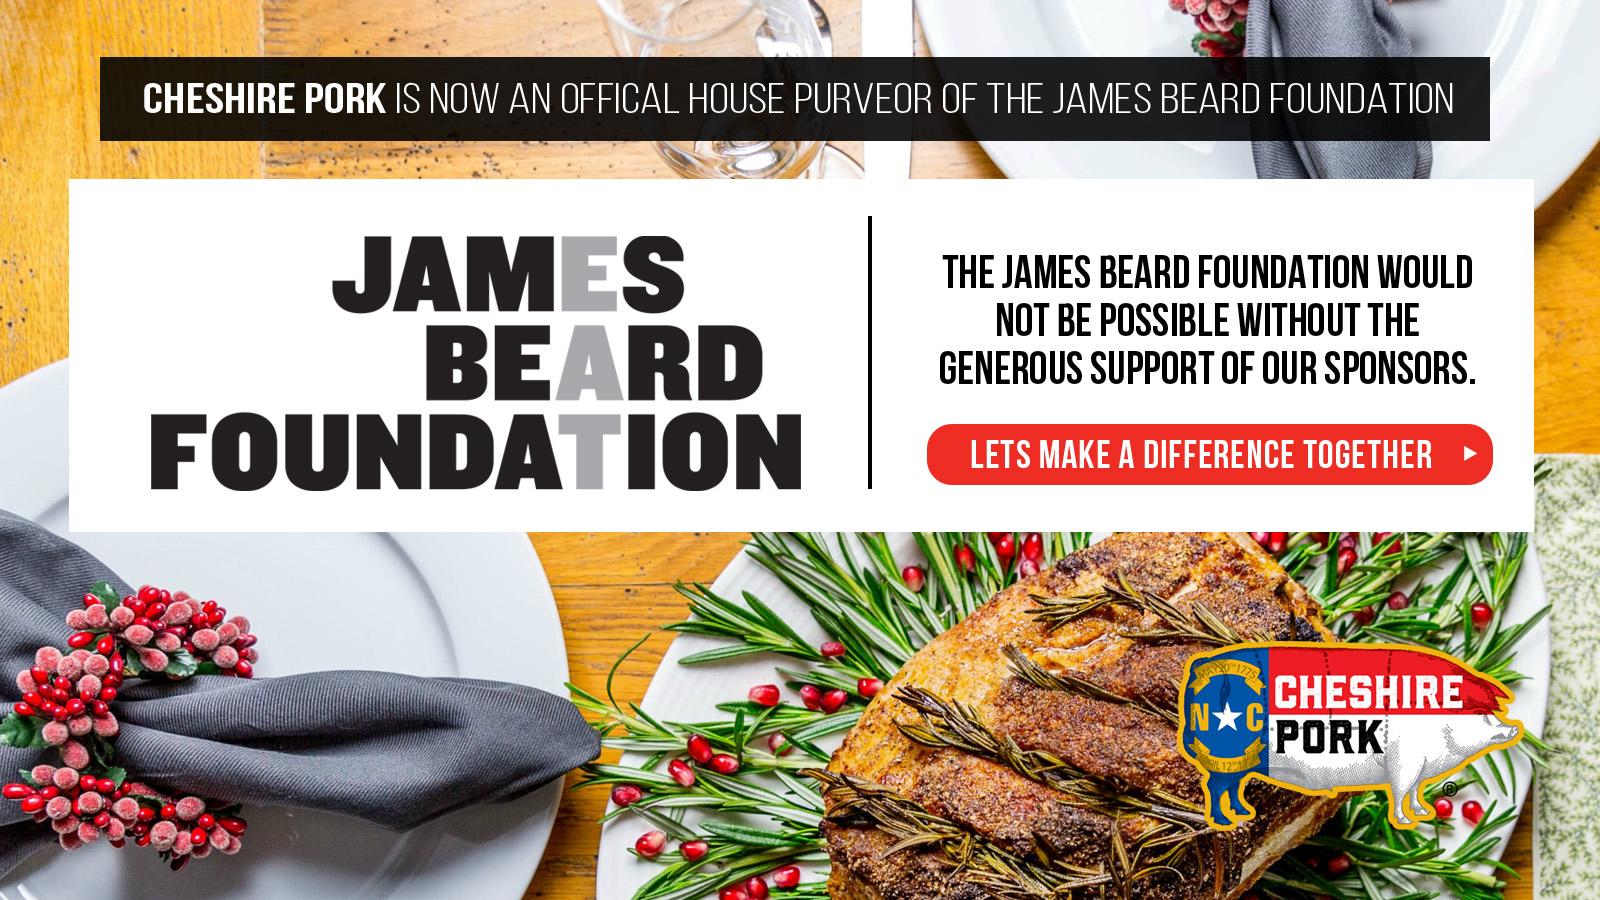 Cheshire Pork - proud sponsor of the James Beard Foundation